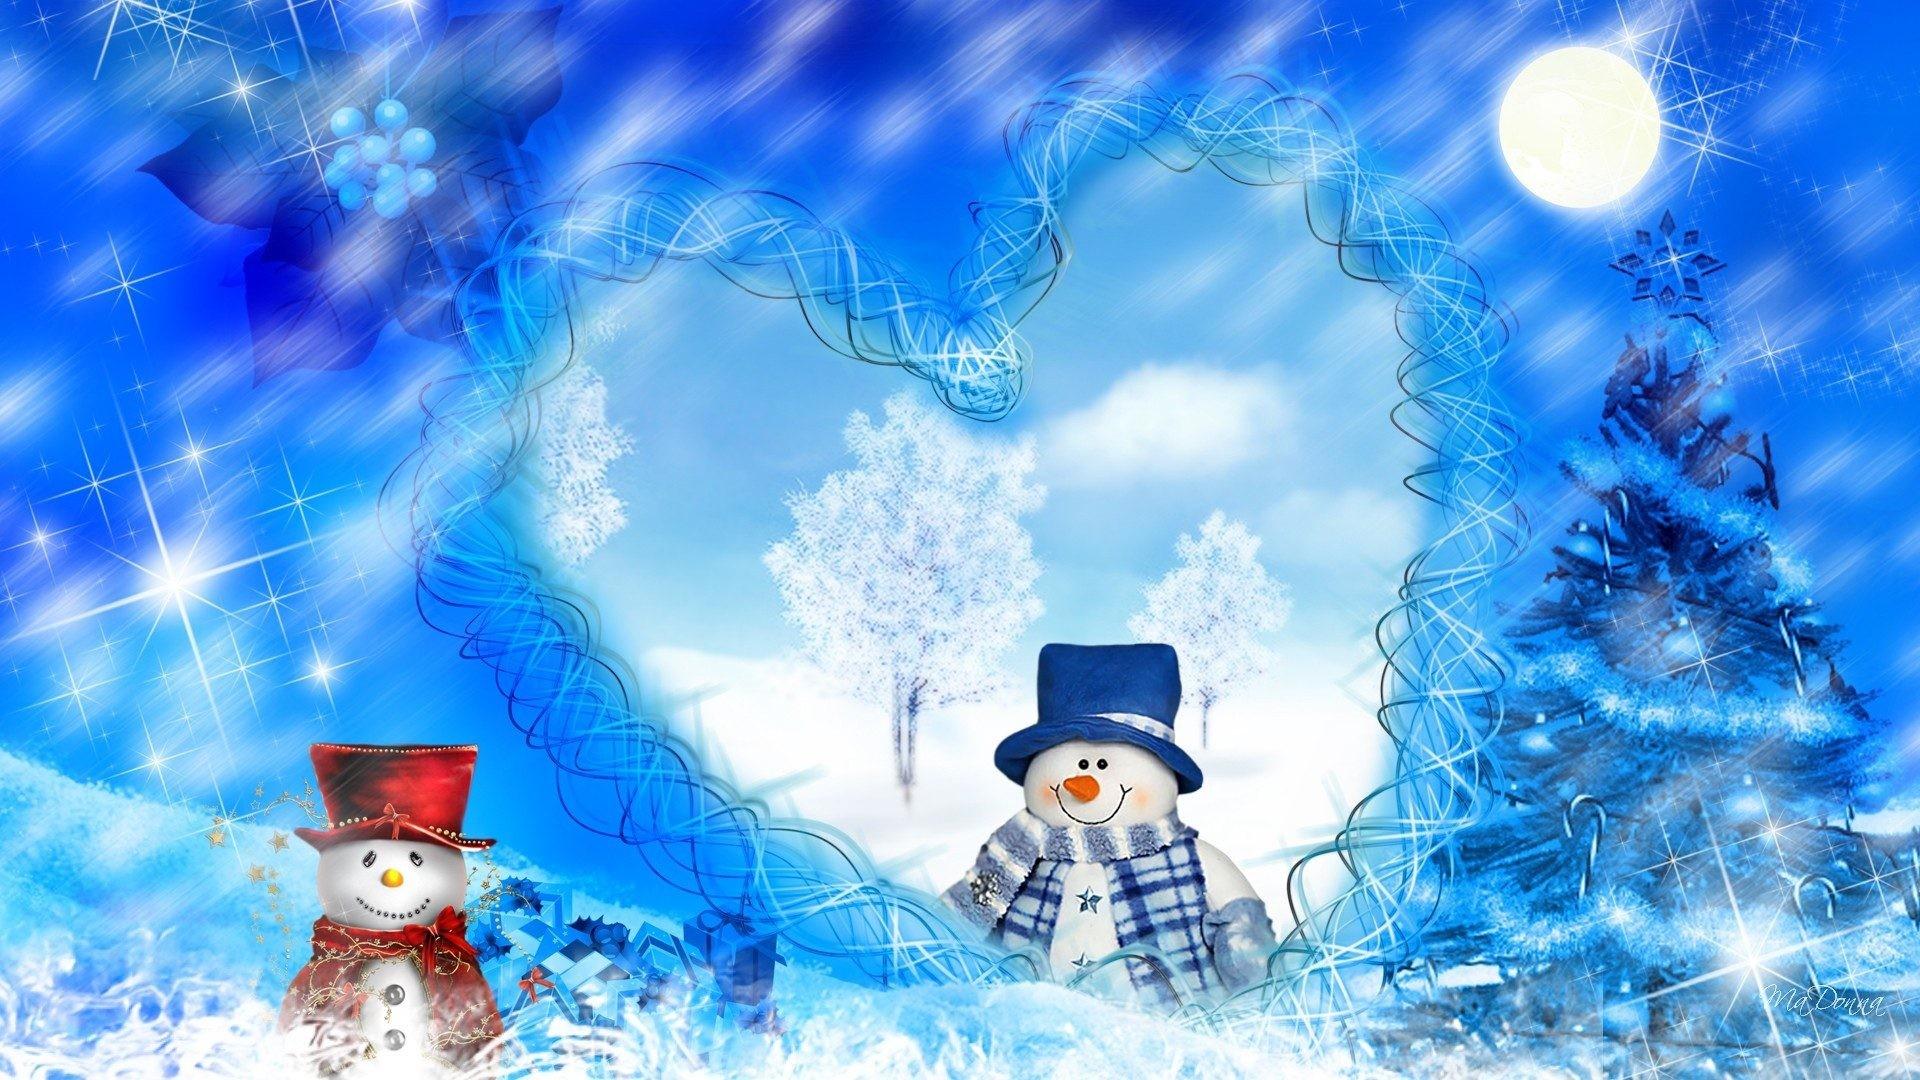 winter snowman wallpaper 61 images